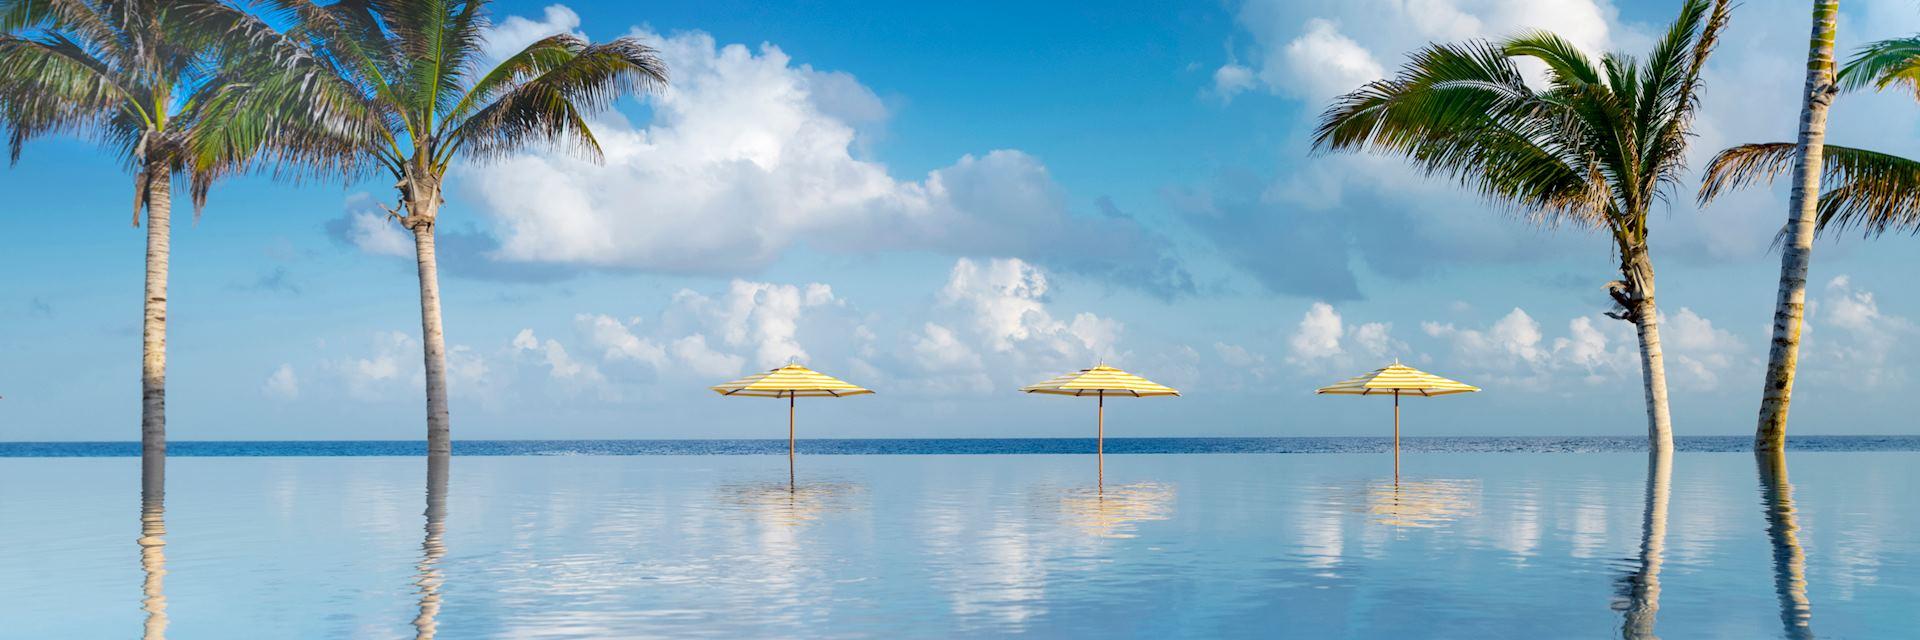 Infinity pool, Half Moon, Jamaica